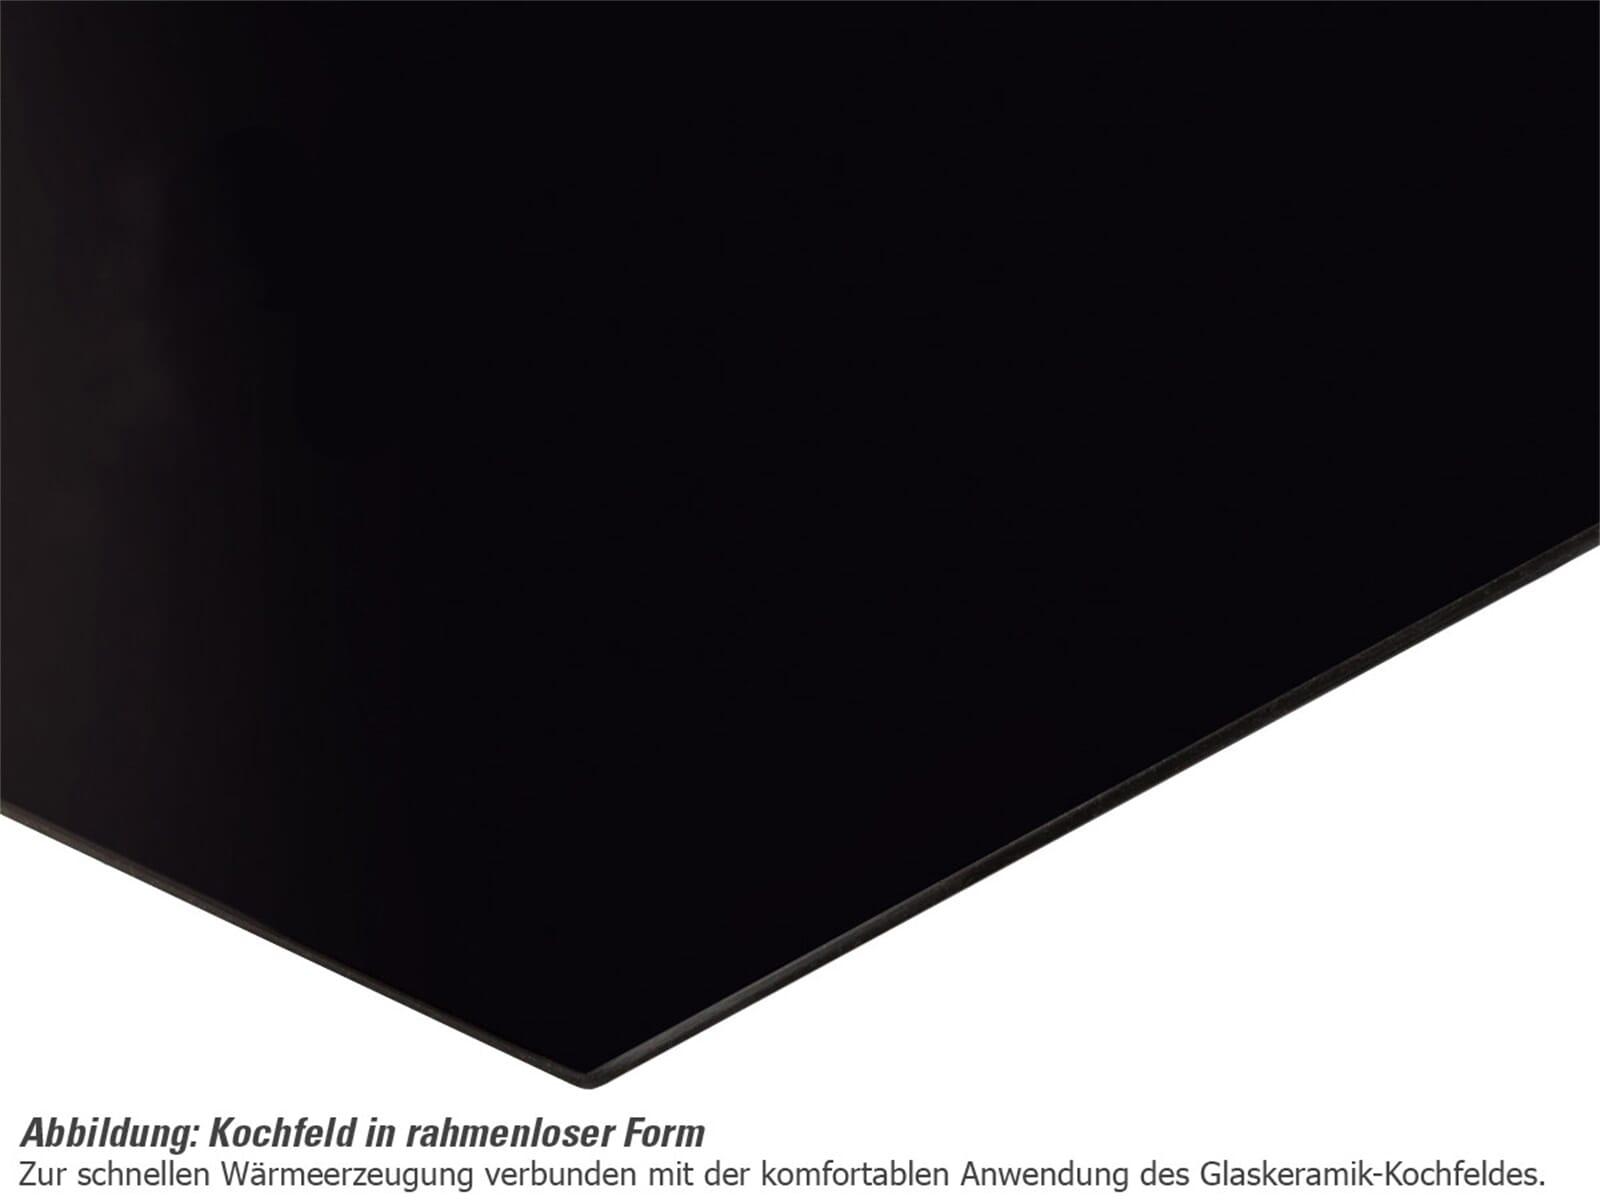 Oranier FLI 2088 SL+ - 2088 11 Induktionskochfeld autark